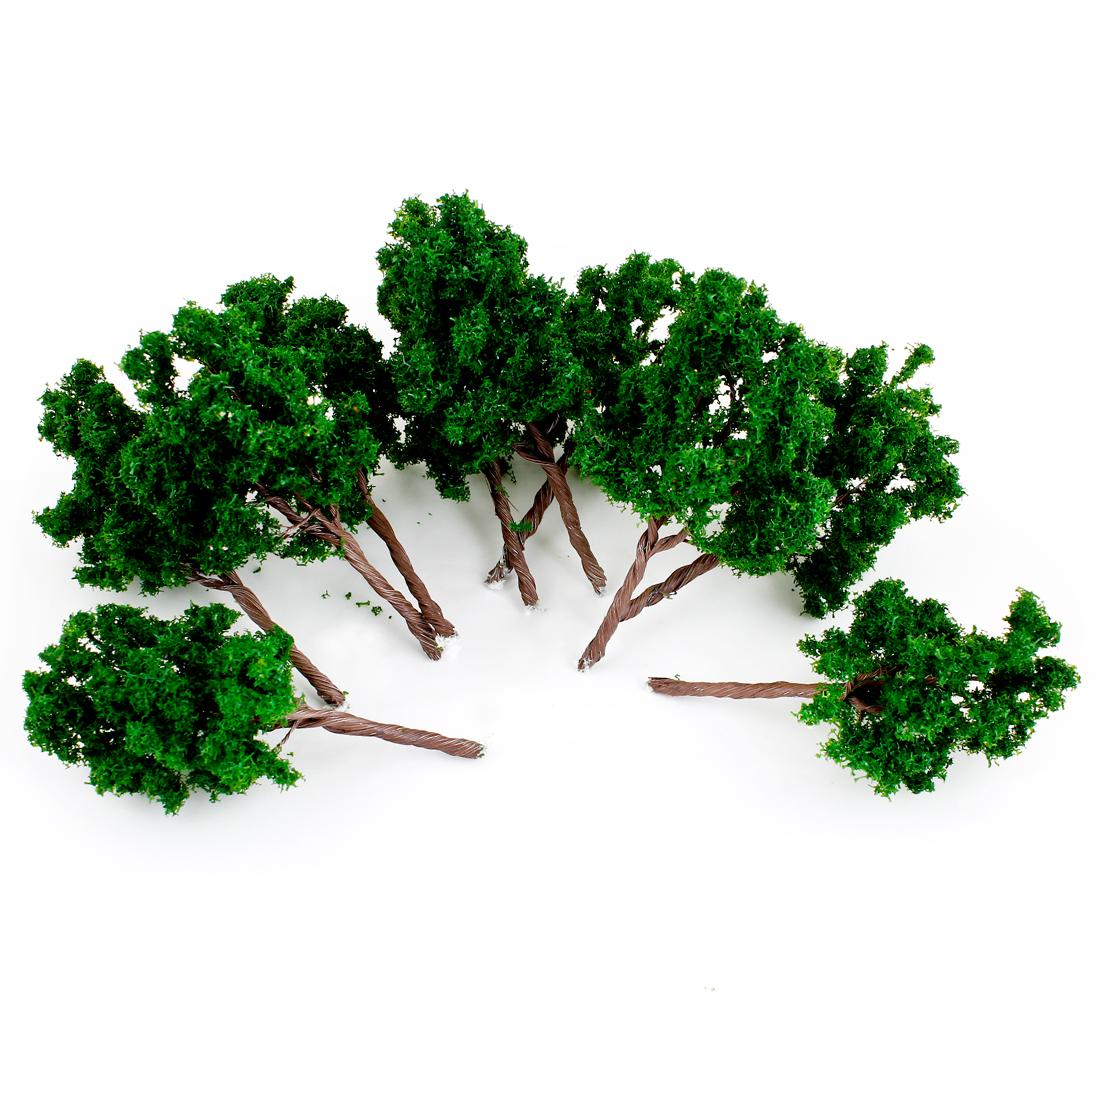 11cm High Scale 1:75-100 Art Green Scenery Model Tree 10 Pcs